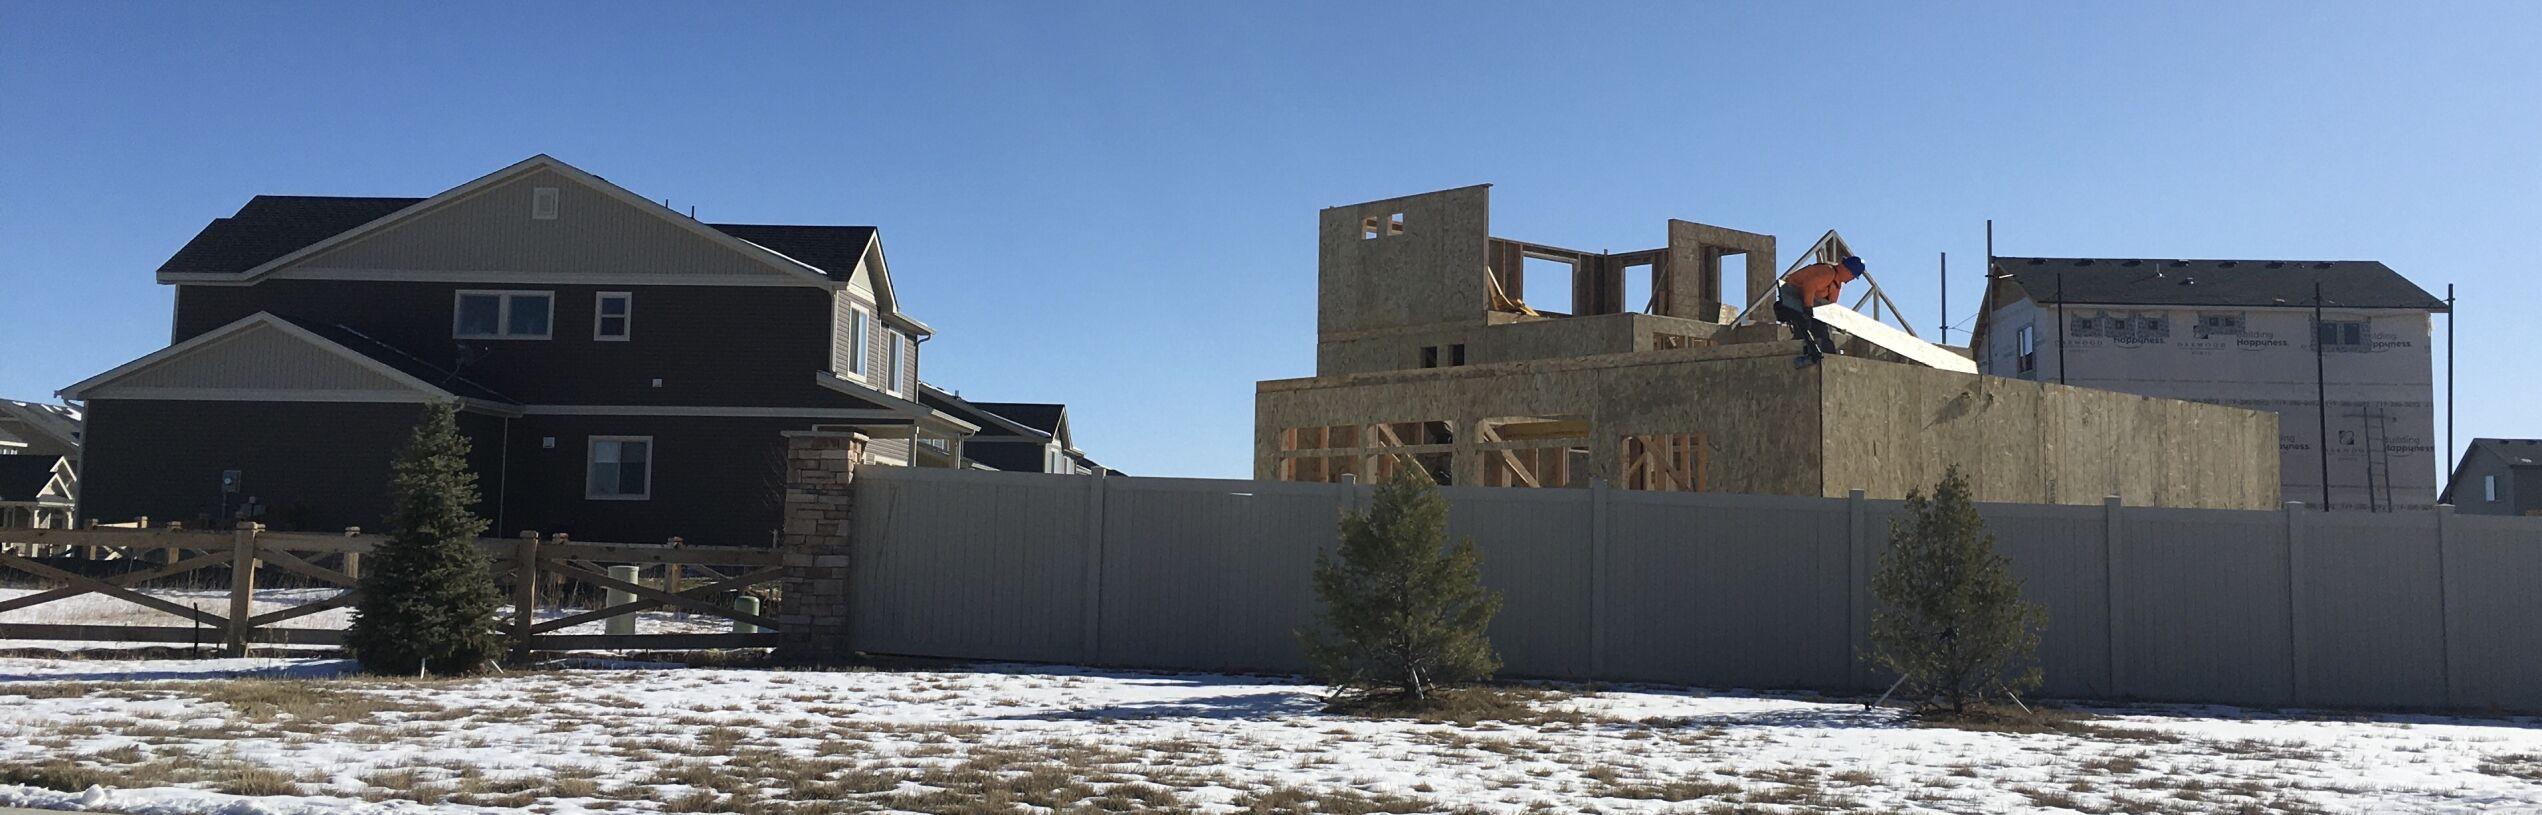 gazette.com - Rich Laden - Colorado Springs-area home construction soars to 15-year high